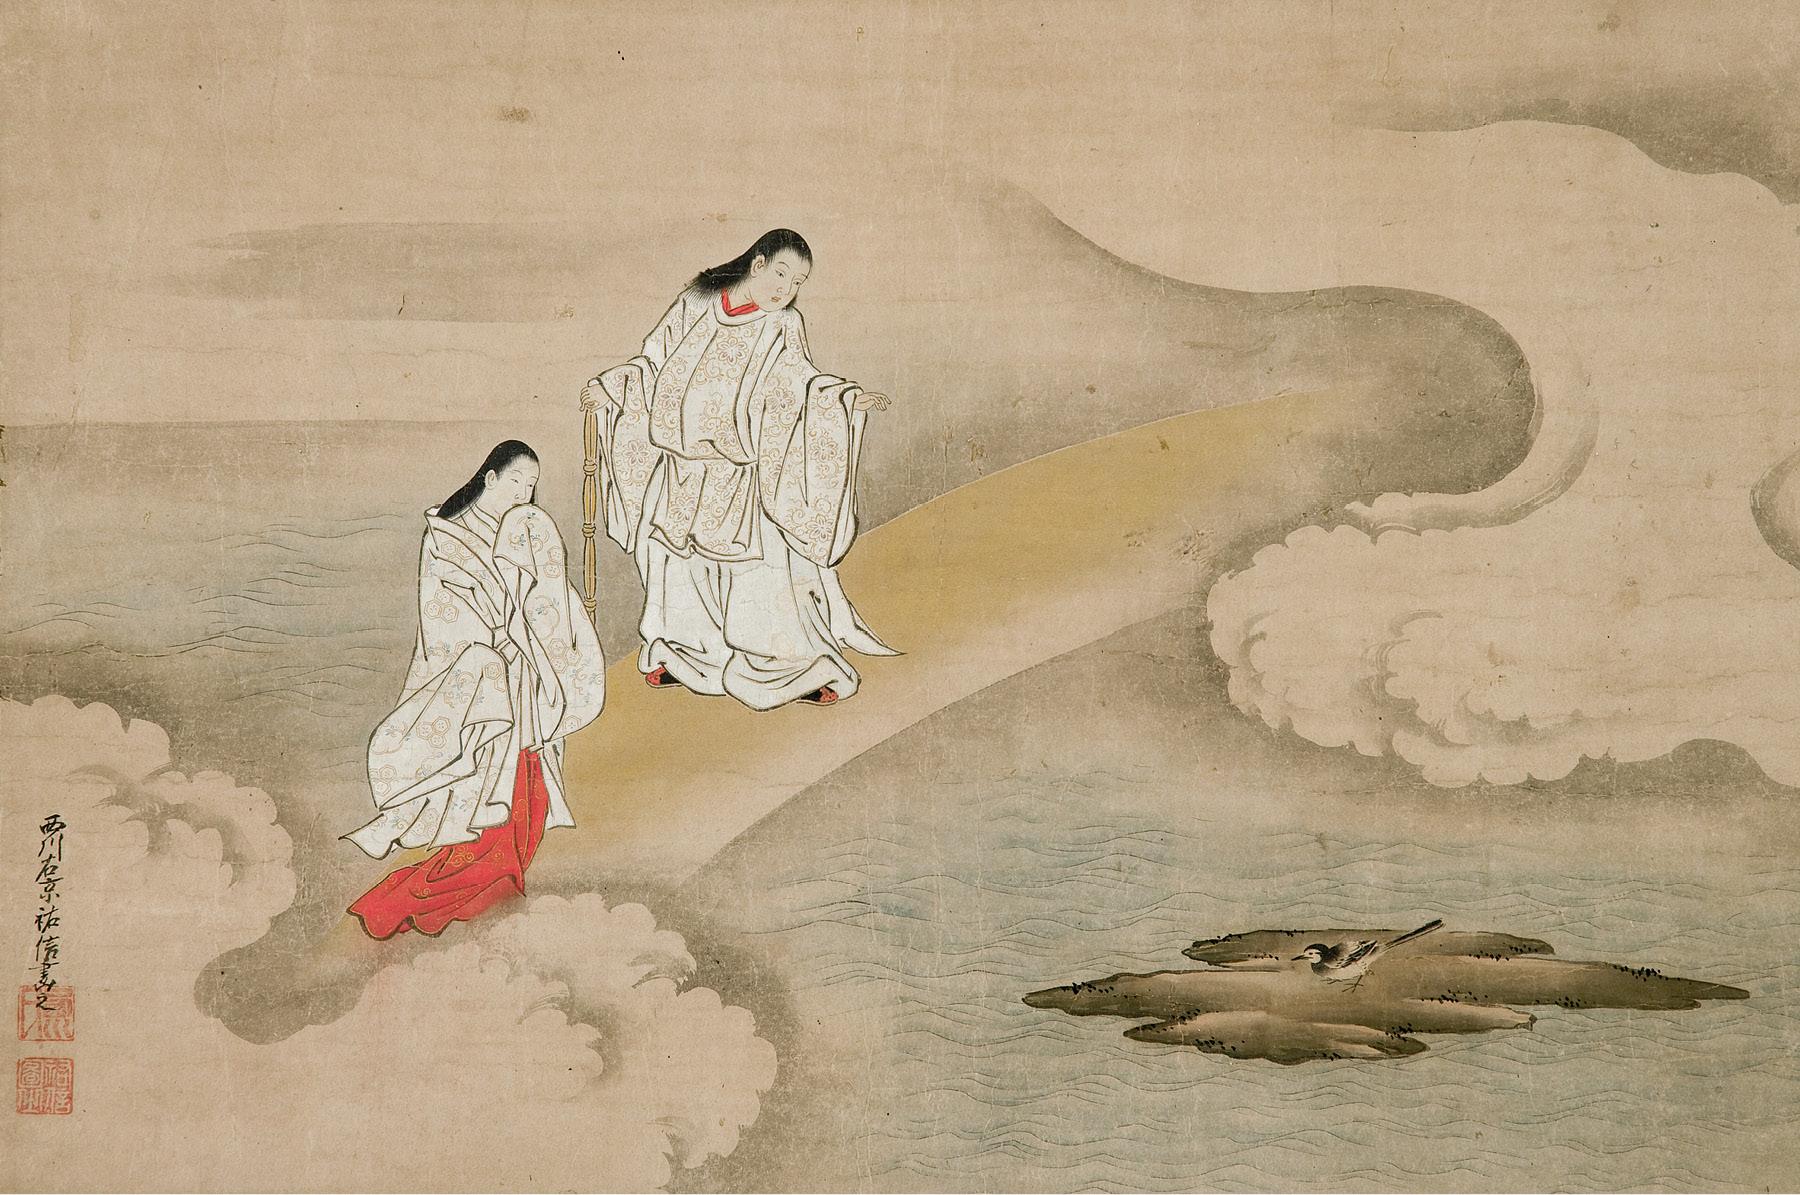 Kết quả hình ảnh cho izanagi izanami